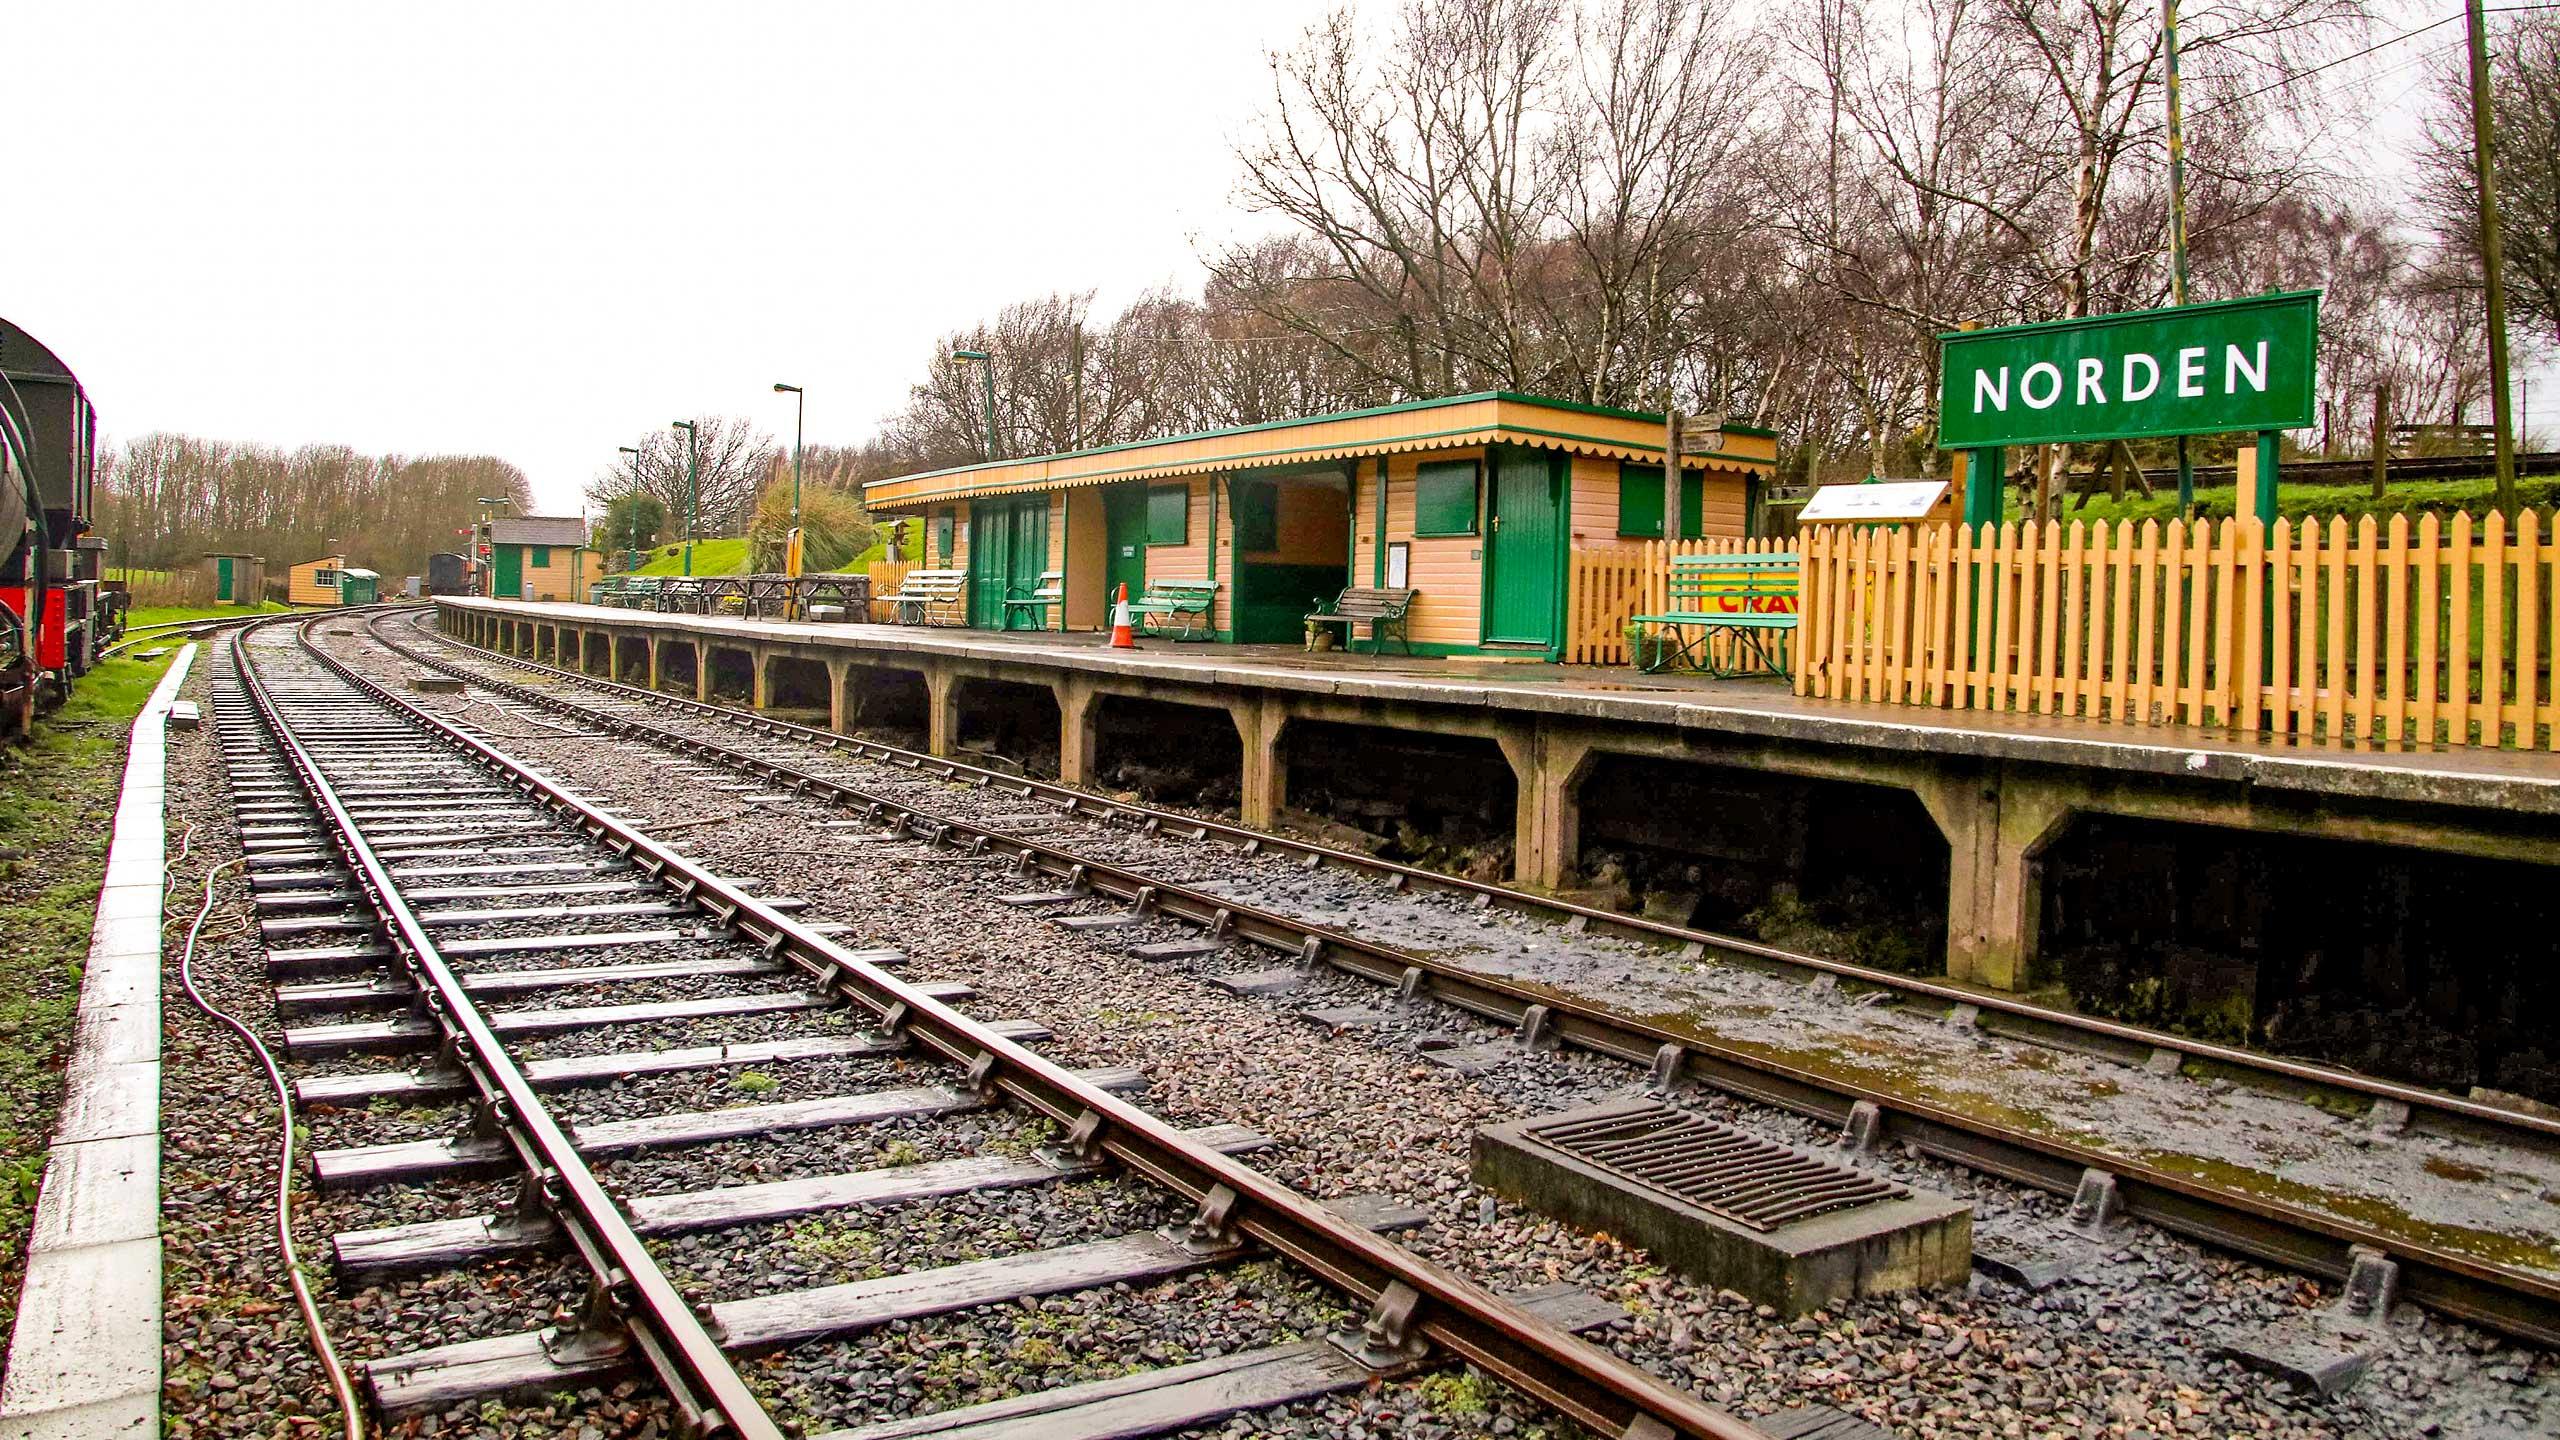 Purbeck Community Rail Partnership Sliding Banner Norden Railway Station 03 2560x1440px